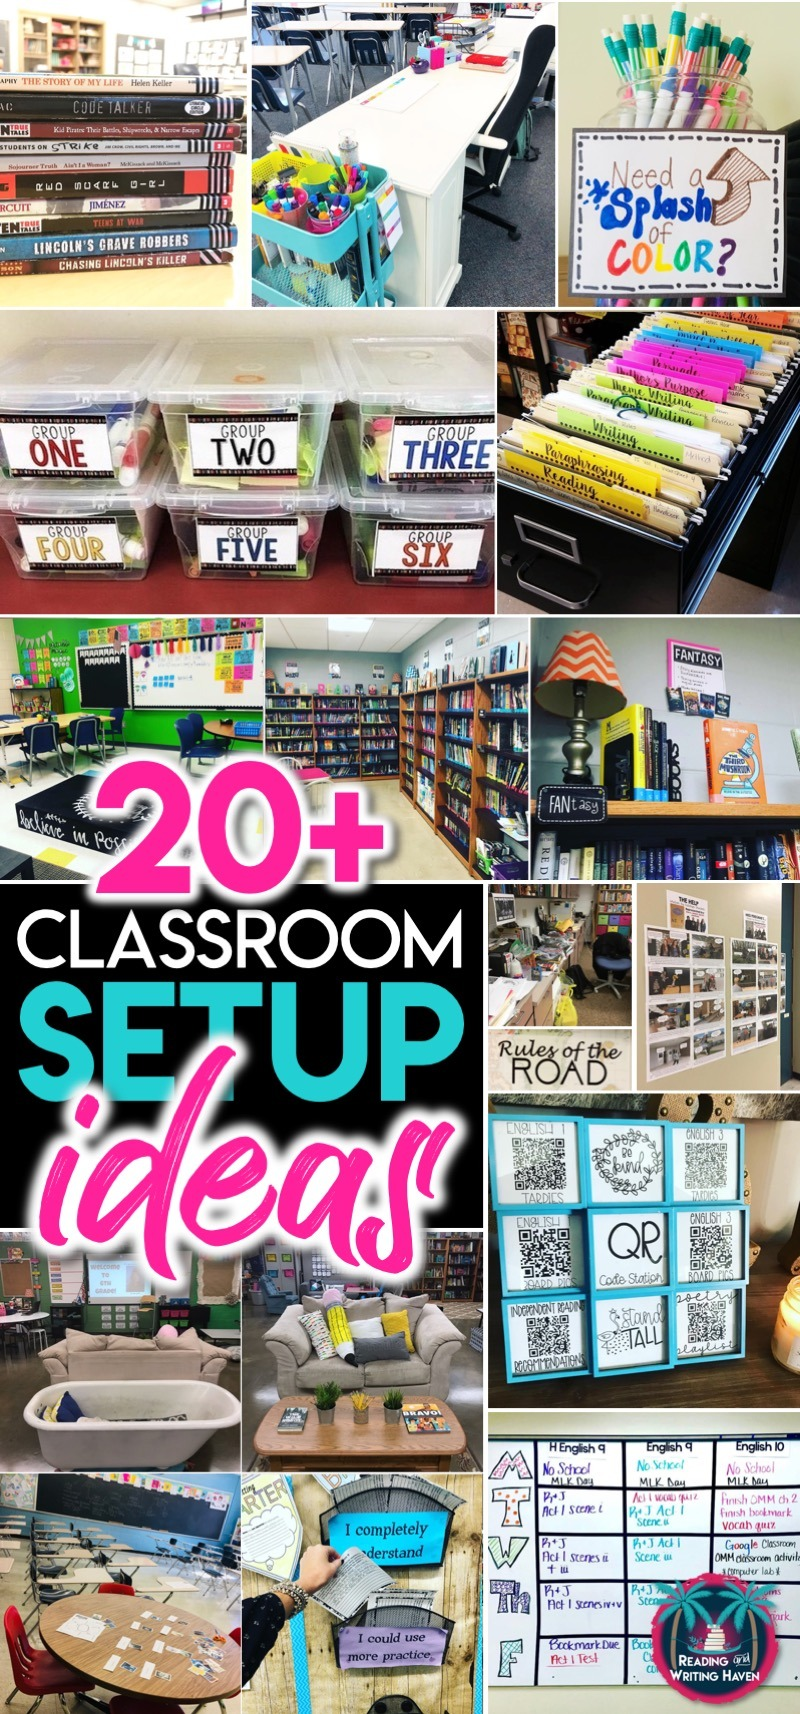 20 plus classroom setup ideas for secondary #ClassroomSetup #SecondaryELA